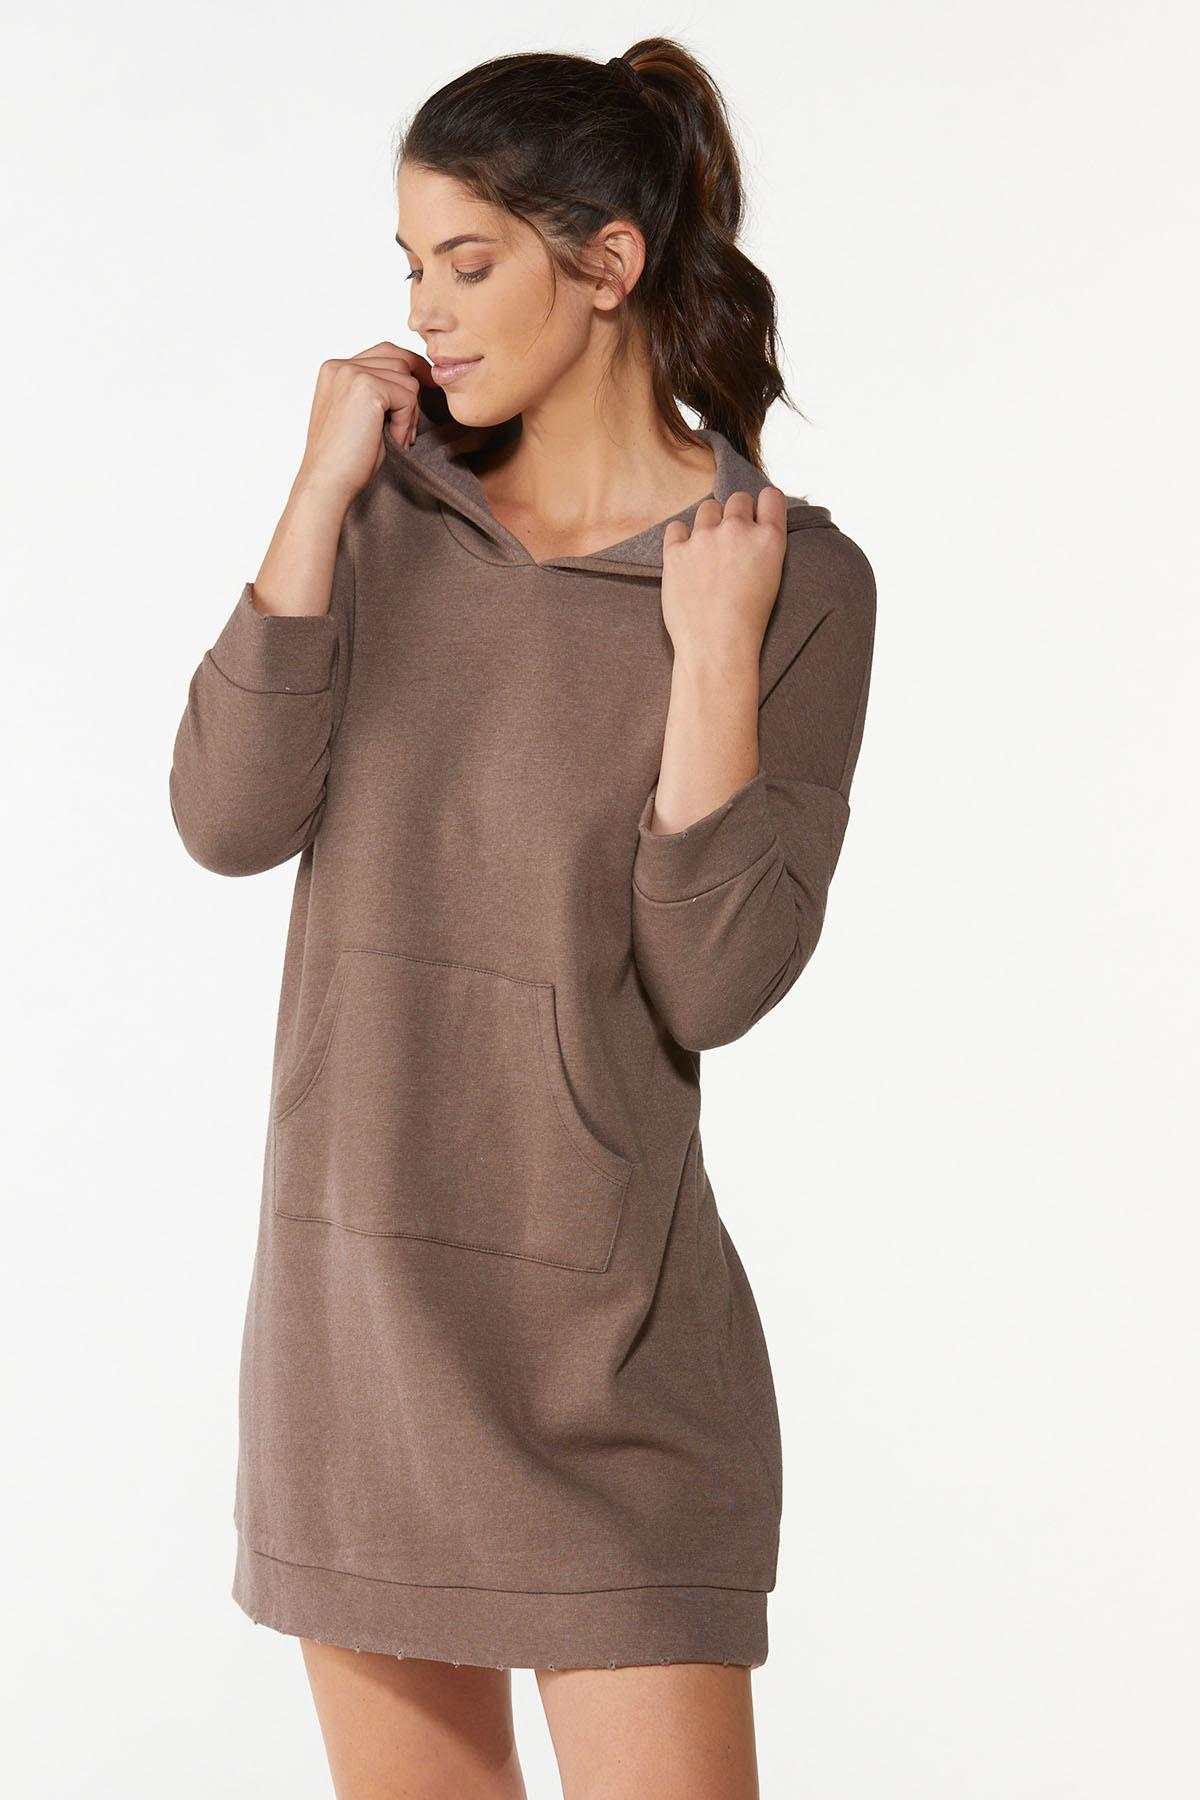 Hooded Sweatshirt Dress (Item #44675659)